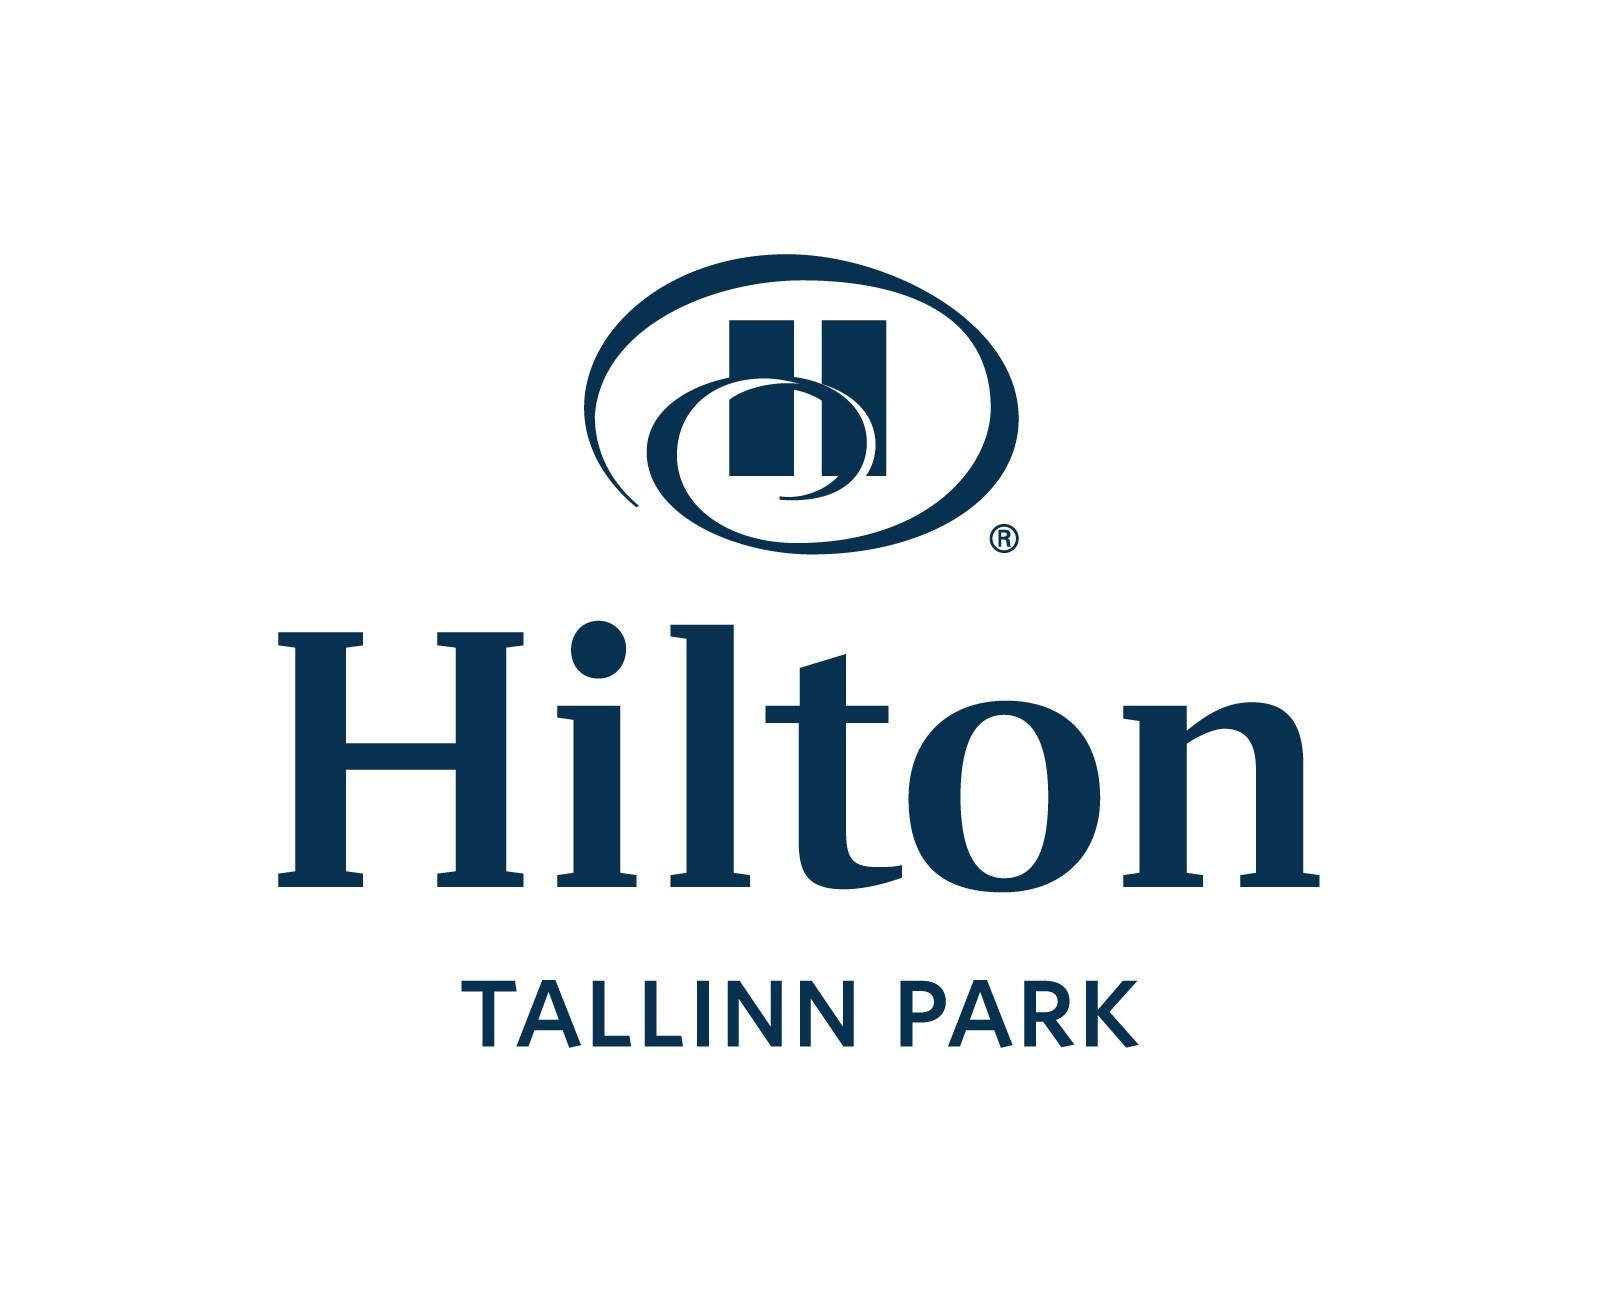 Hilton Hotell